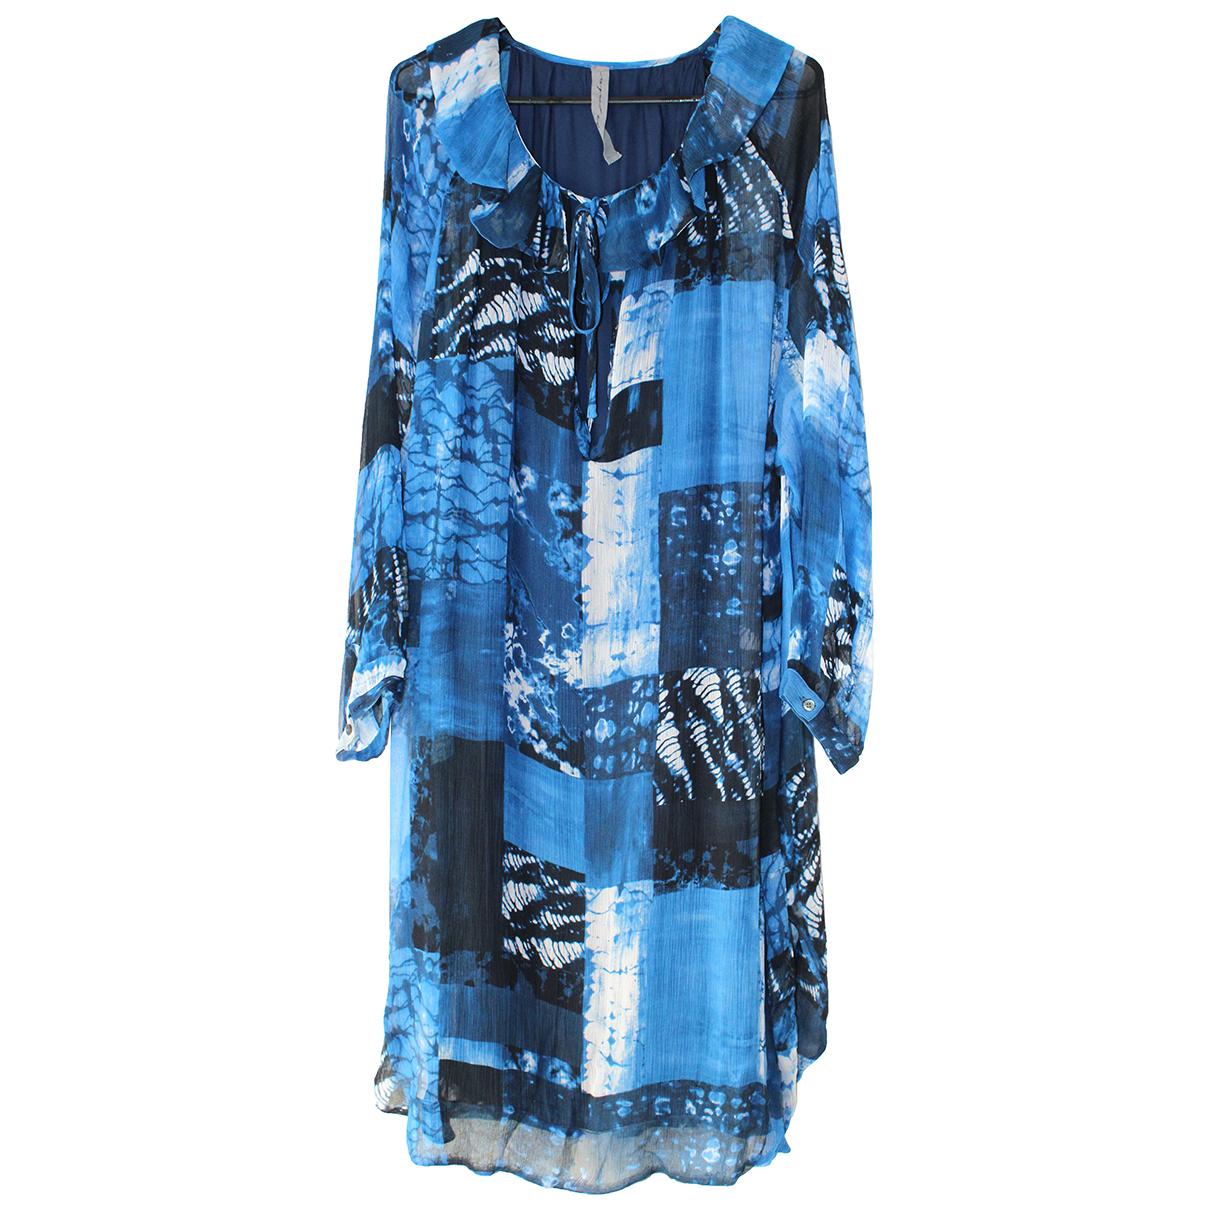 Raquel Allegra \N Blue dress for Women 2 US